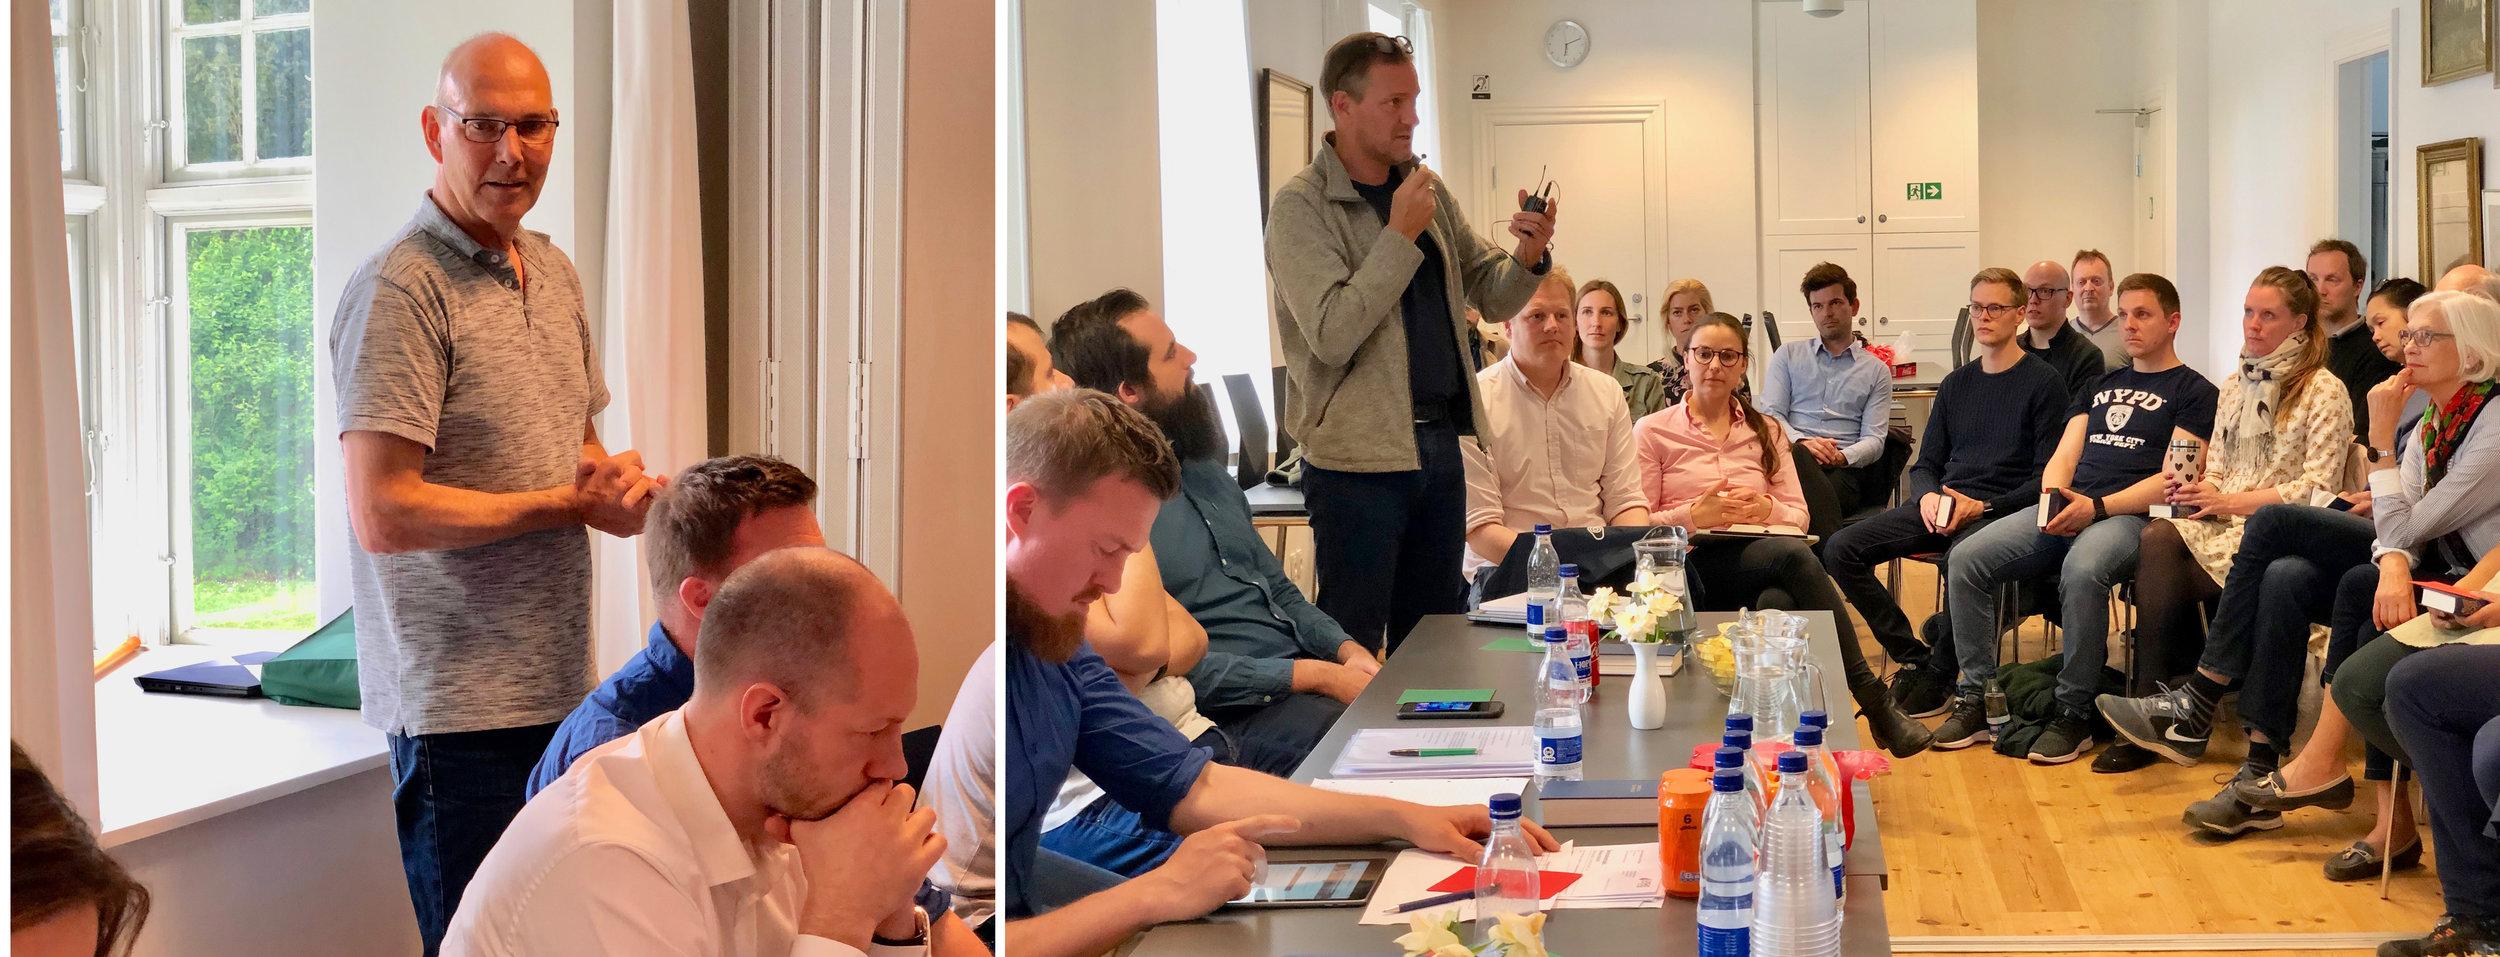 Formanden, Ib Sondrup Andersen, bød velkommen og gav herefter ordet til kommunens planchef, Per Jul. Foto: AOB